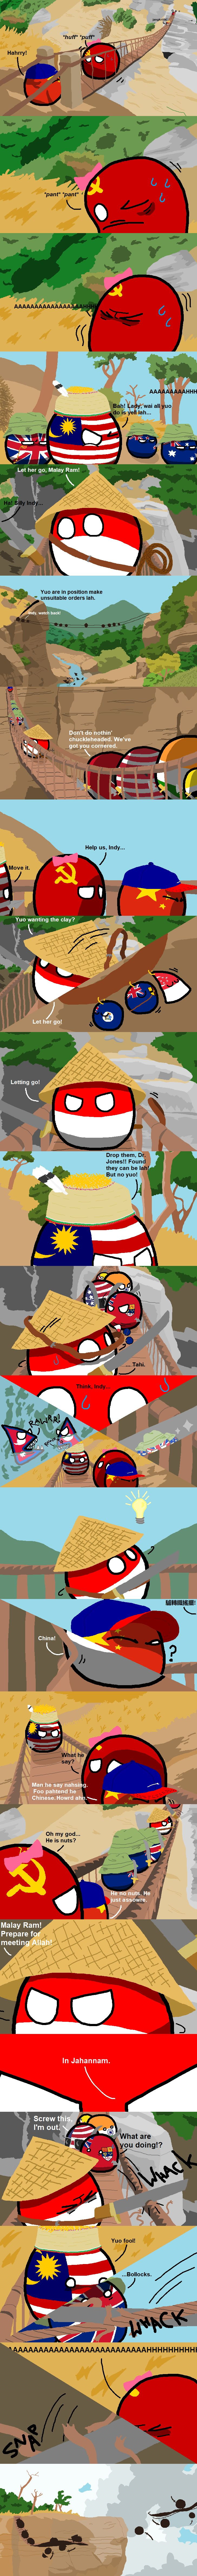 Indonesia Jones and the Temple of Batu | Polandballs Countryballs